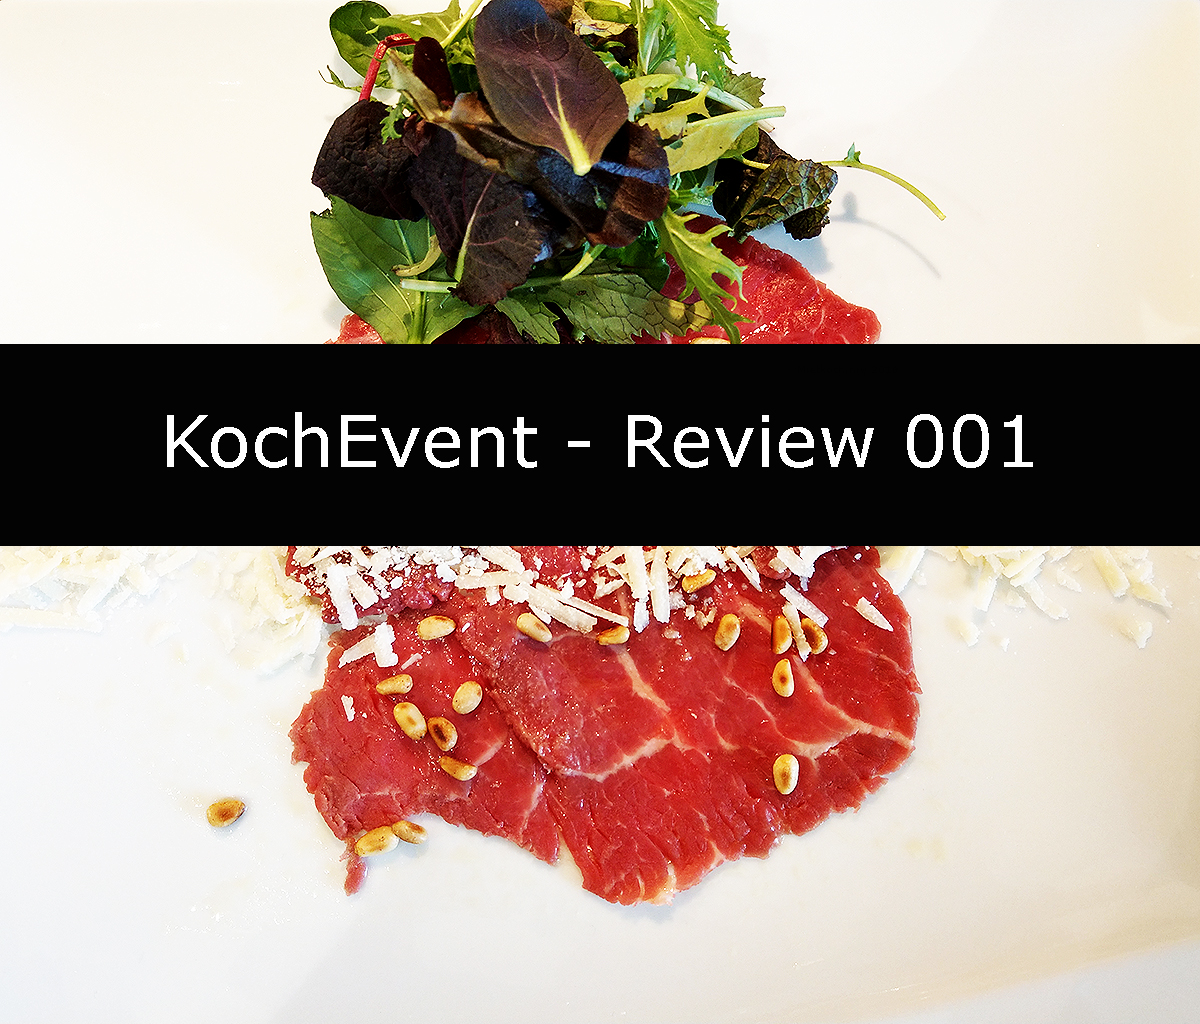 Titel KochEvent - Review 001 mit Carpaccio als Hintergrundbild